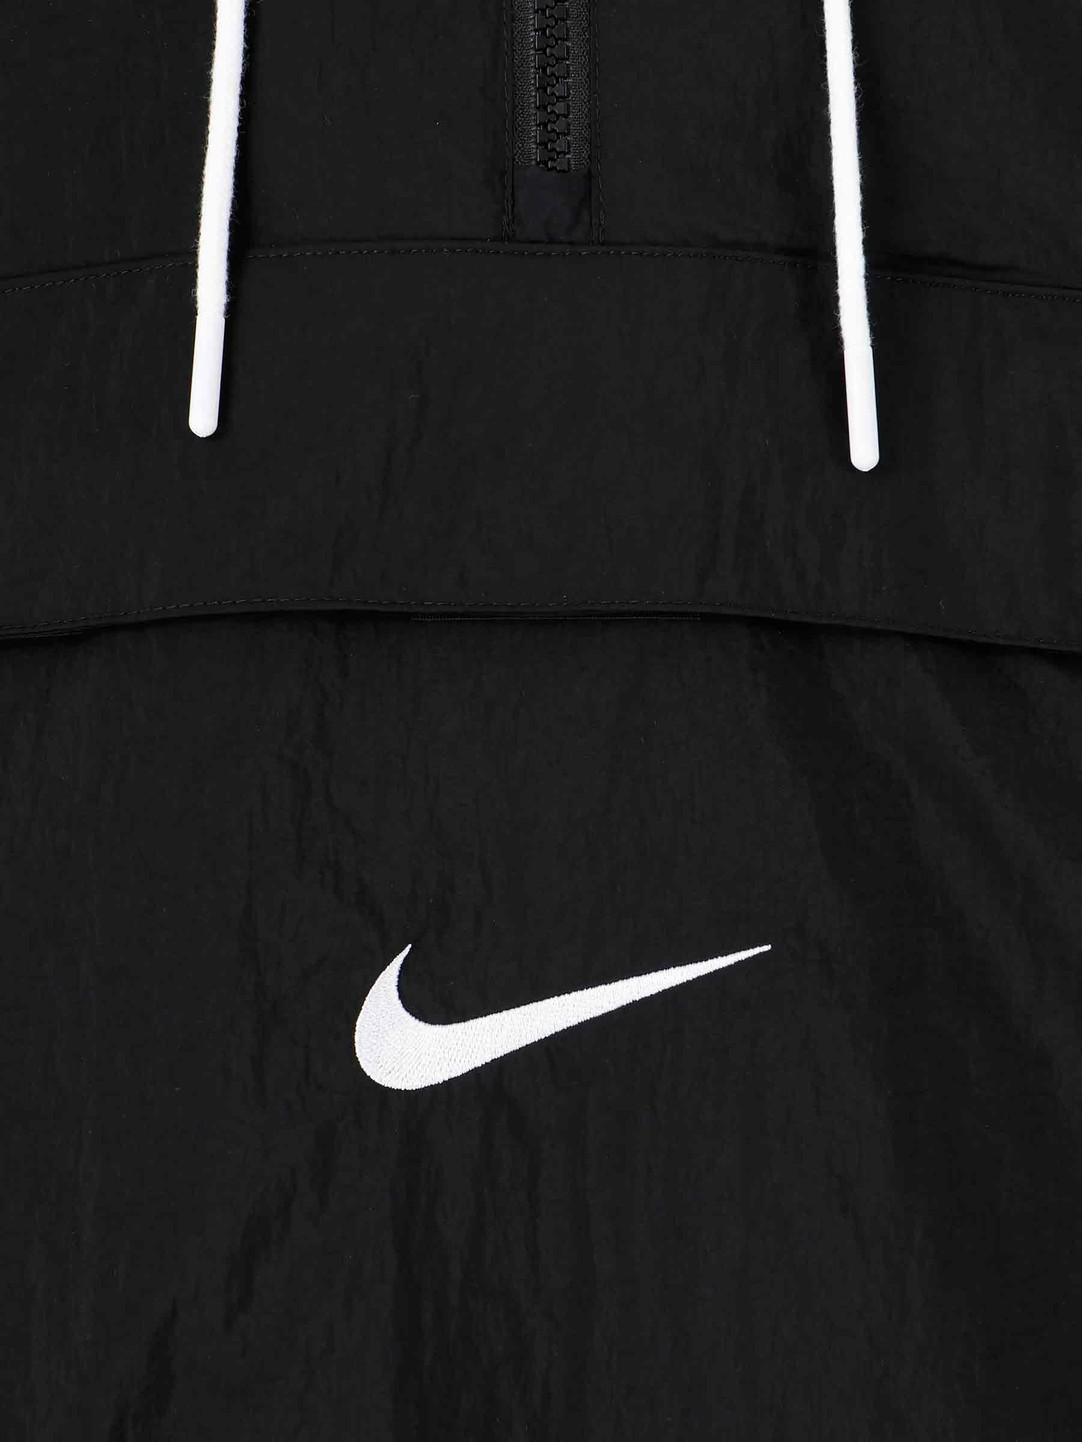 NIKE Sportswear M NSW SWOOSH JKT WVN blackwhitewhite